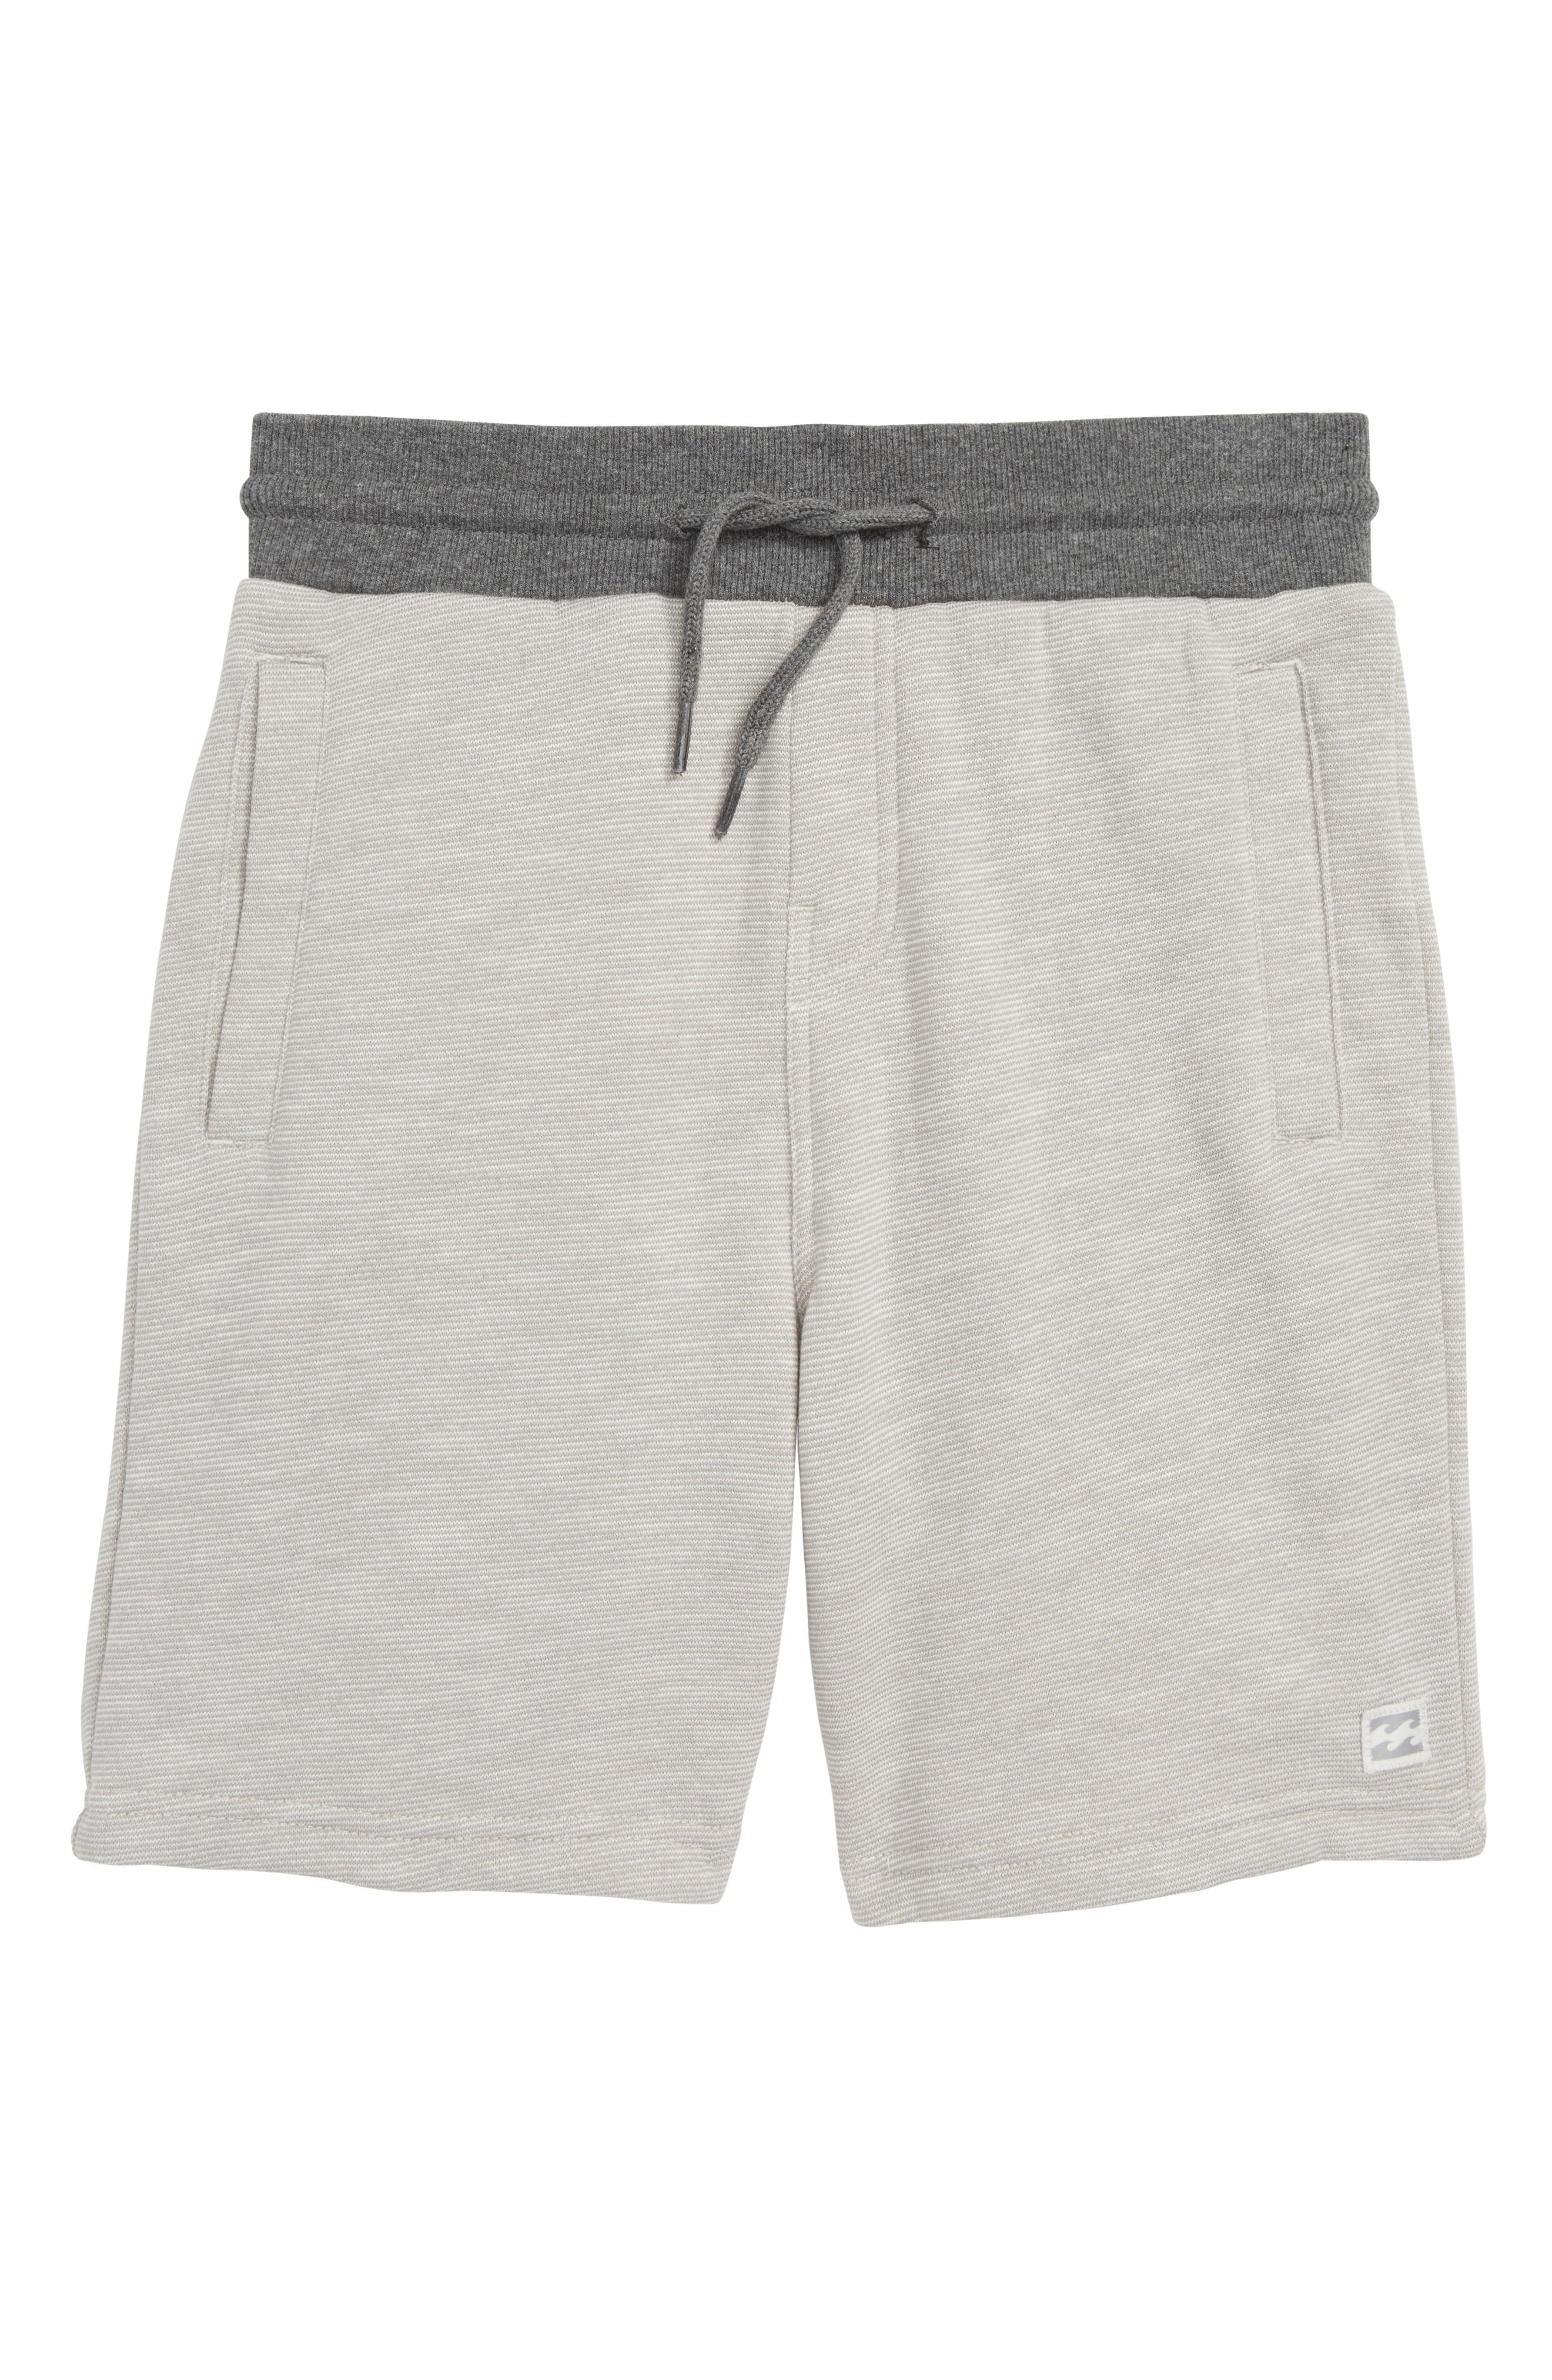 Balance Shorts,                             Main thumbnail 1, color,                             OATMEAL